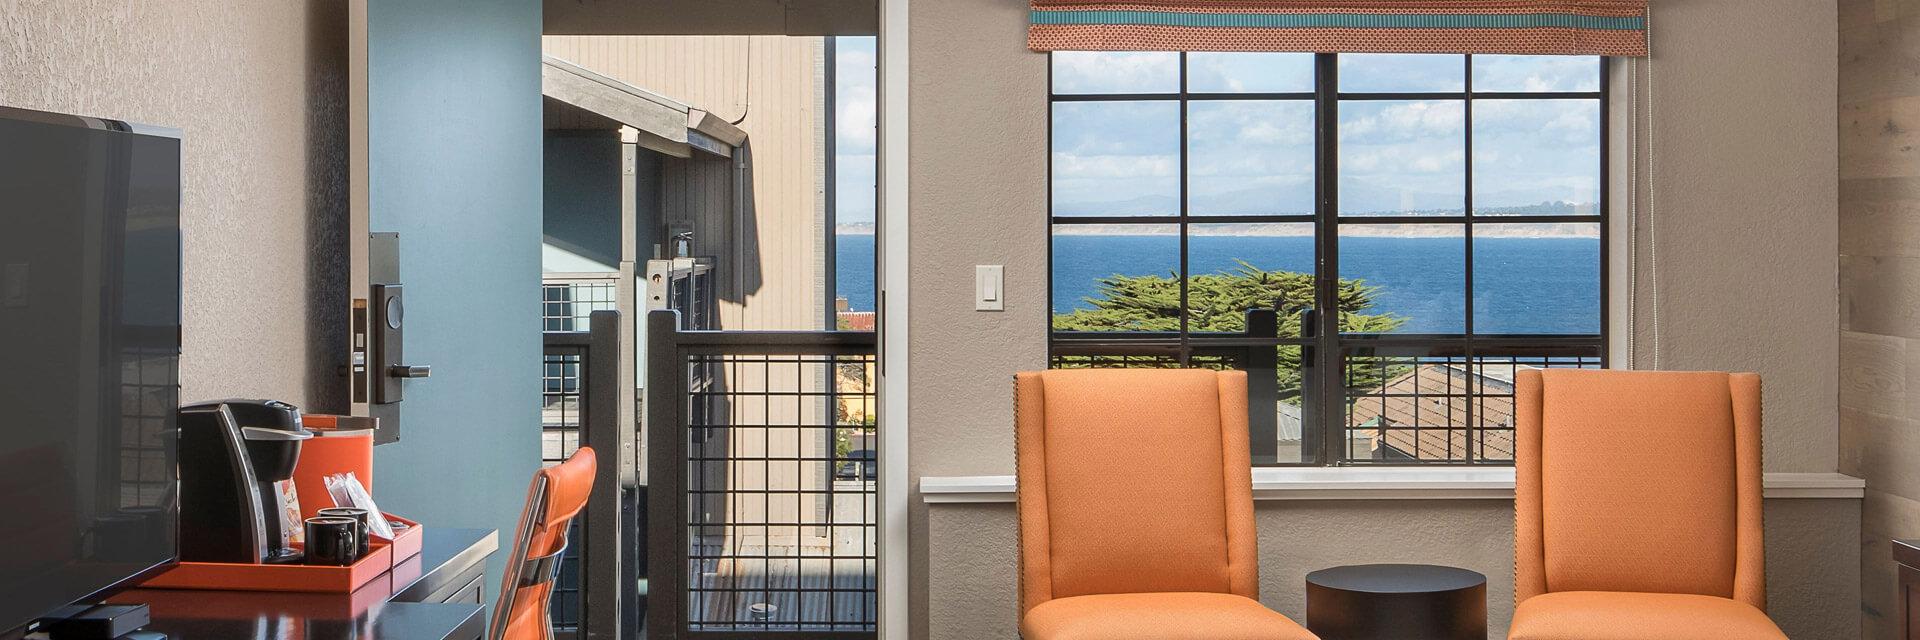 Wave Street Inn Monterey California FAQs